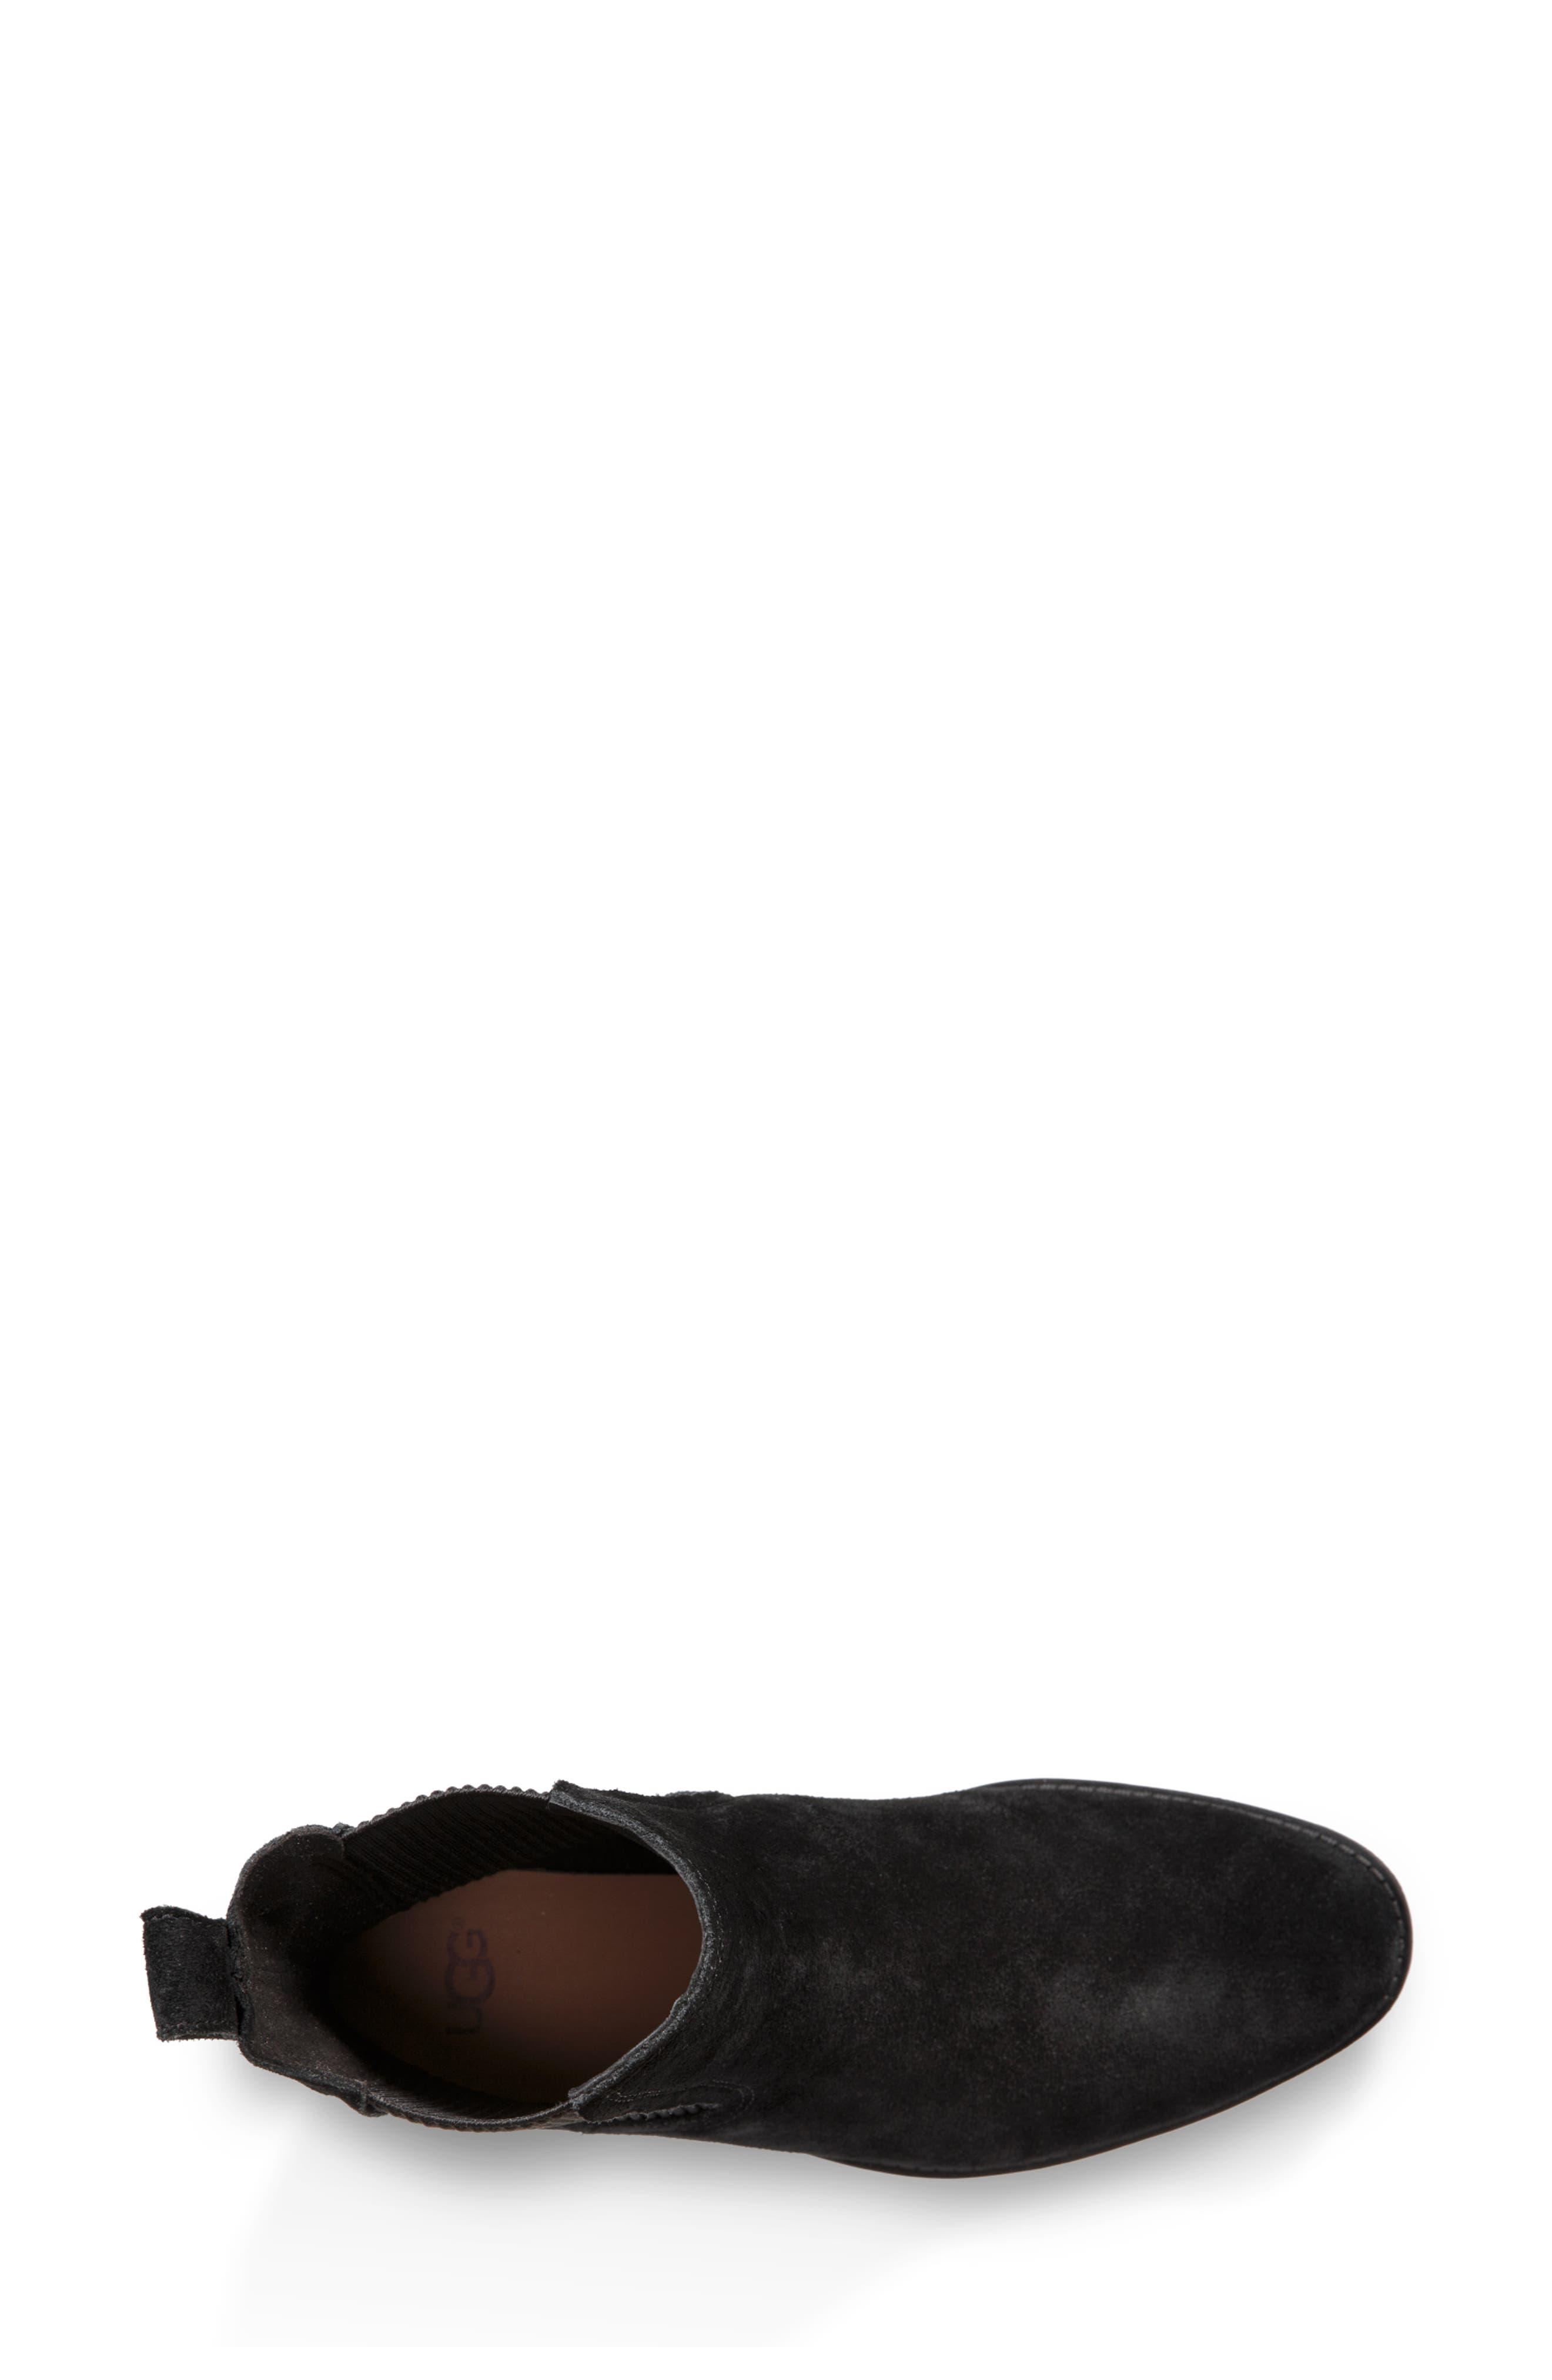 UGG<SUP>®</SUP>, Hillhurst Chelsea Boot, Alternate thumbnail 4, color, 001